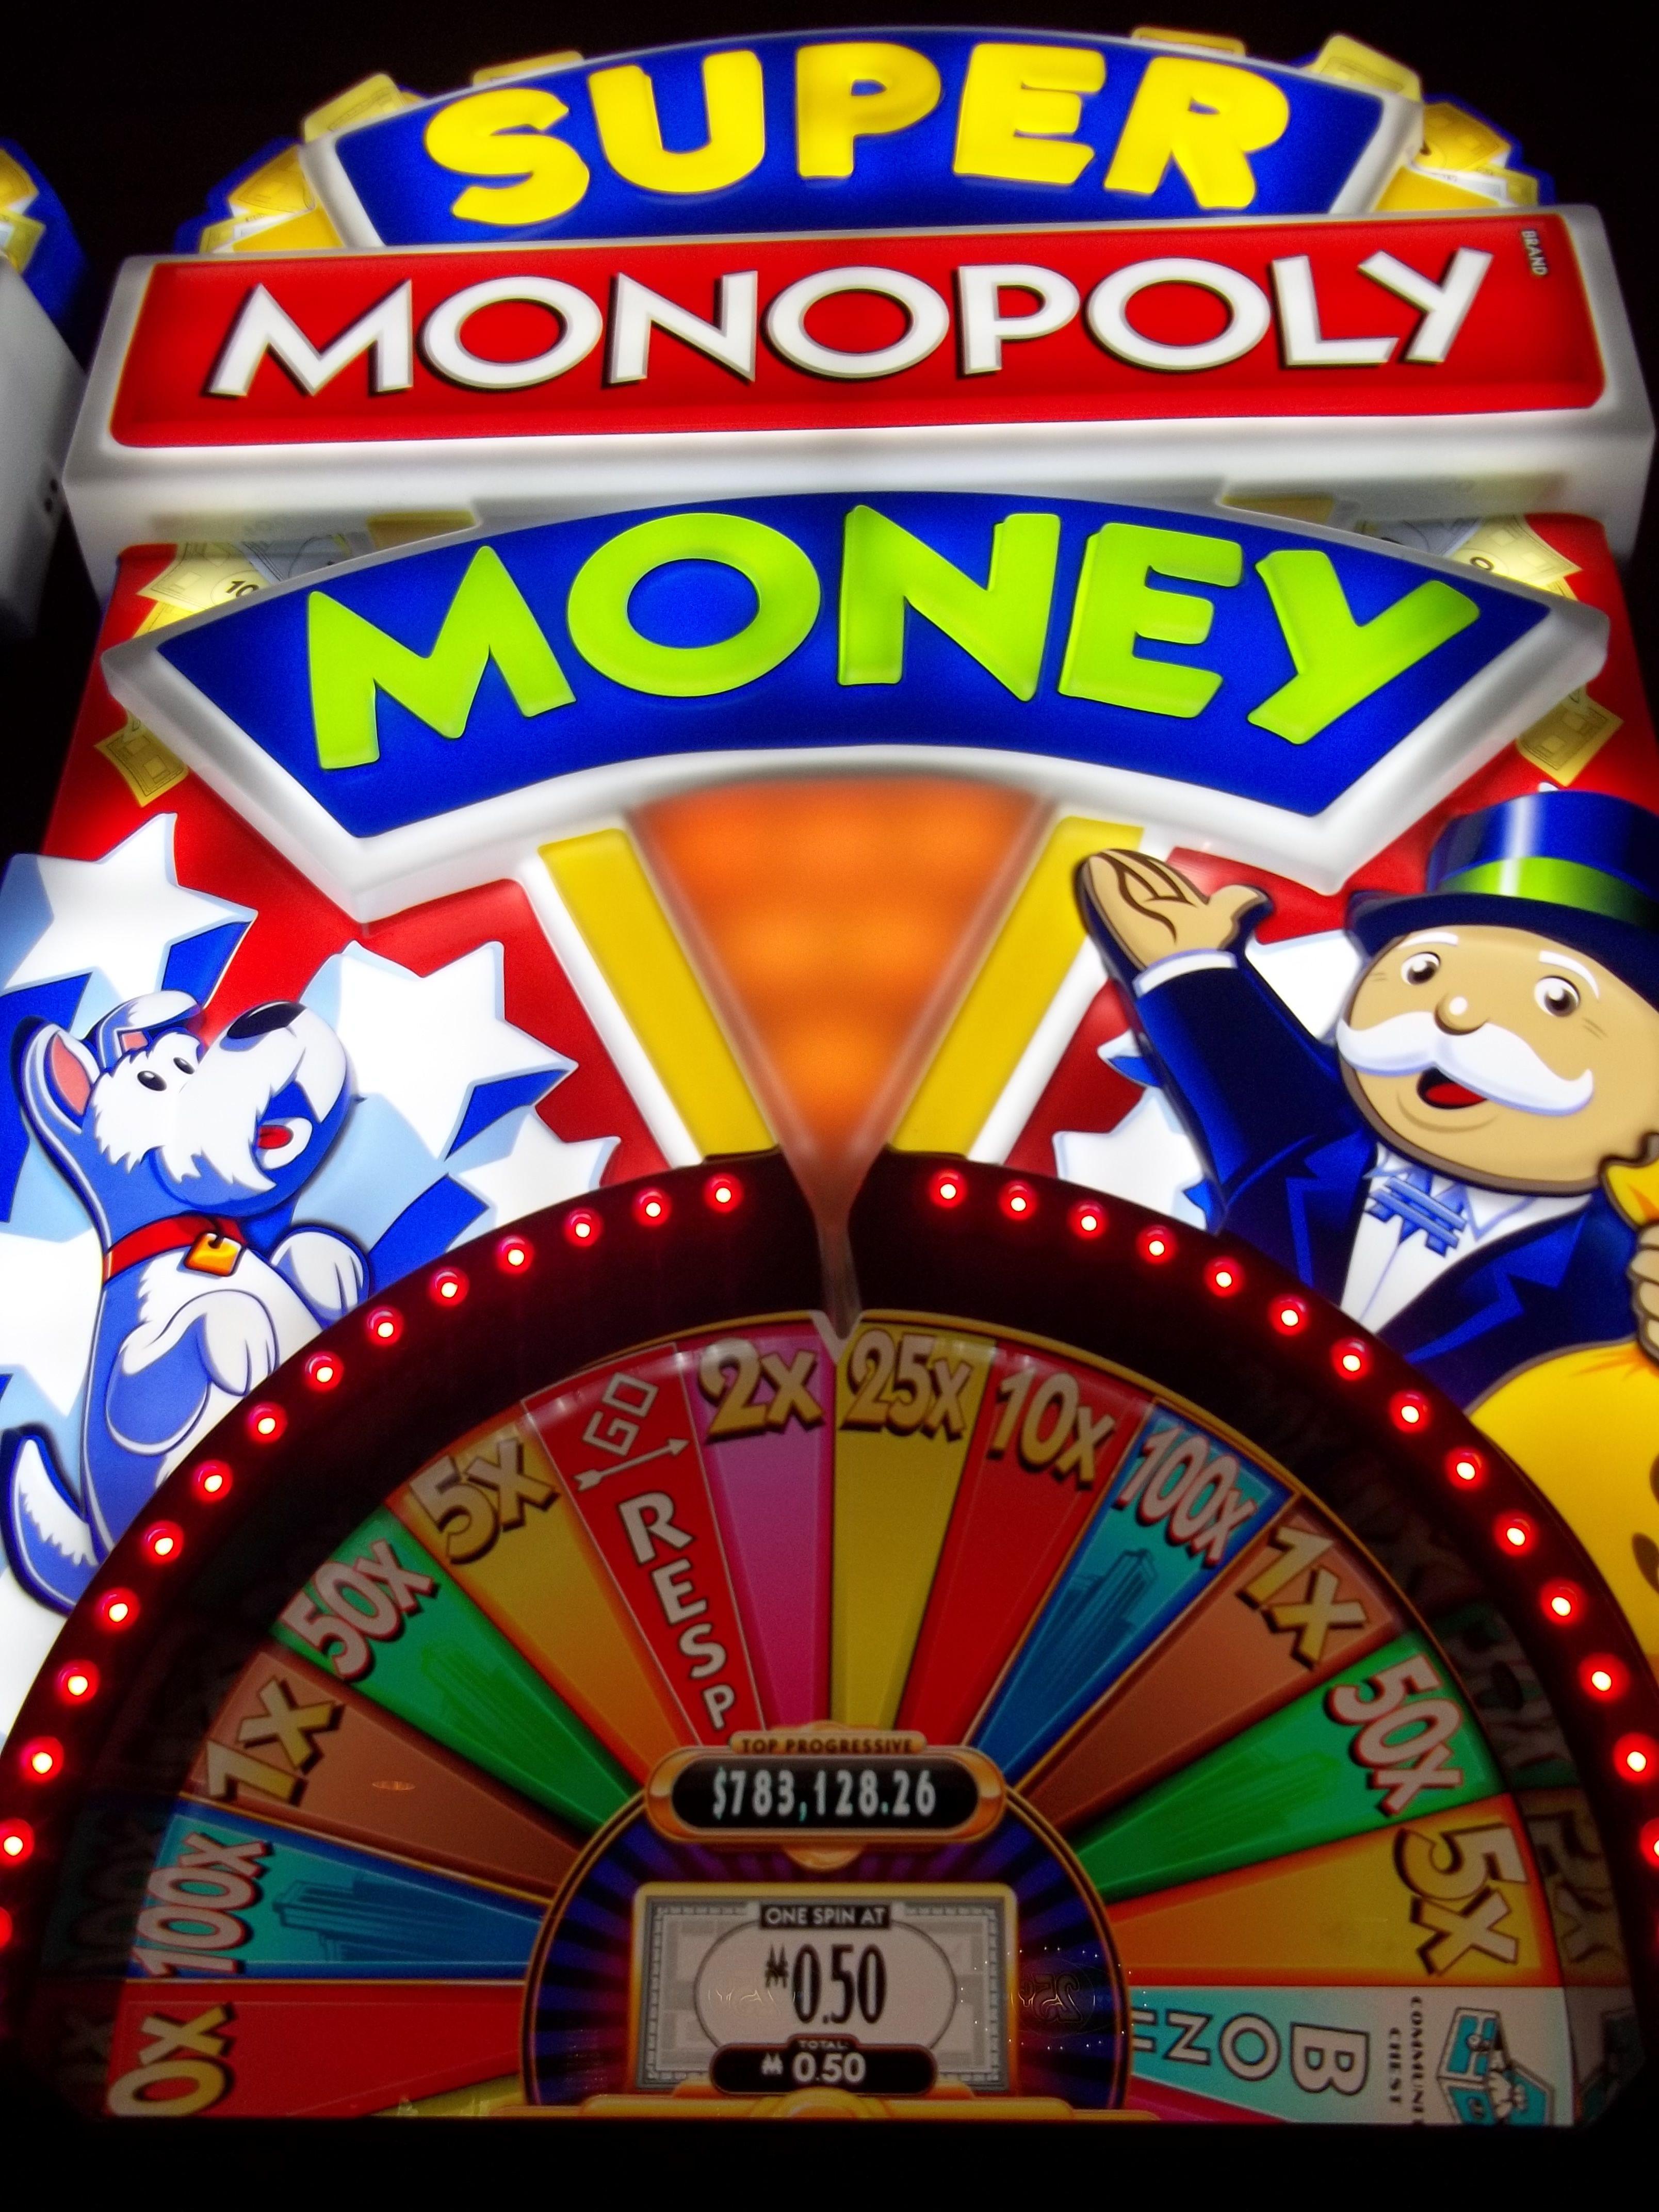 Monopoly On The Money Slot Machine